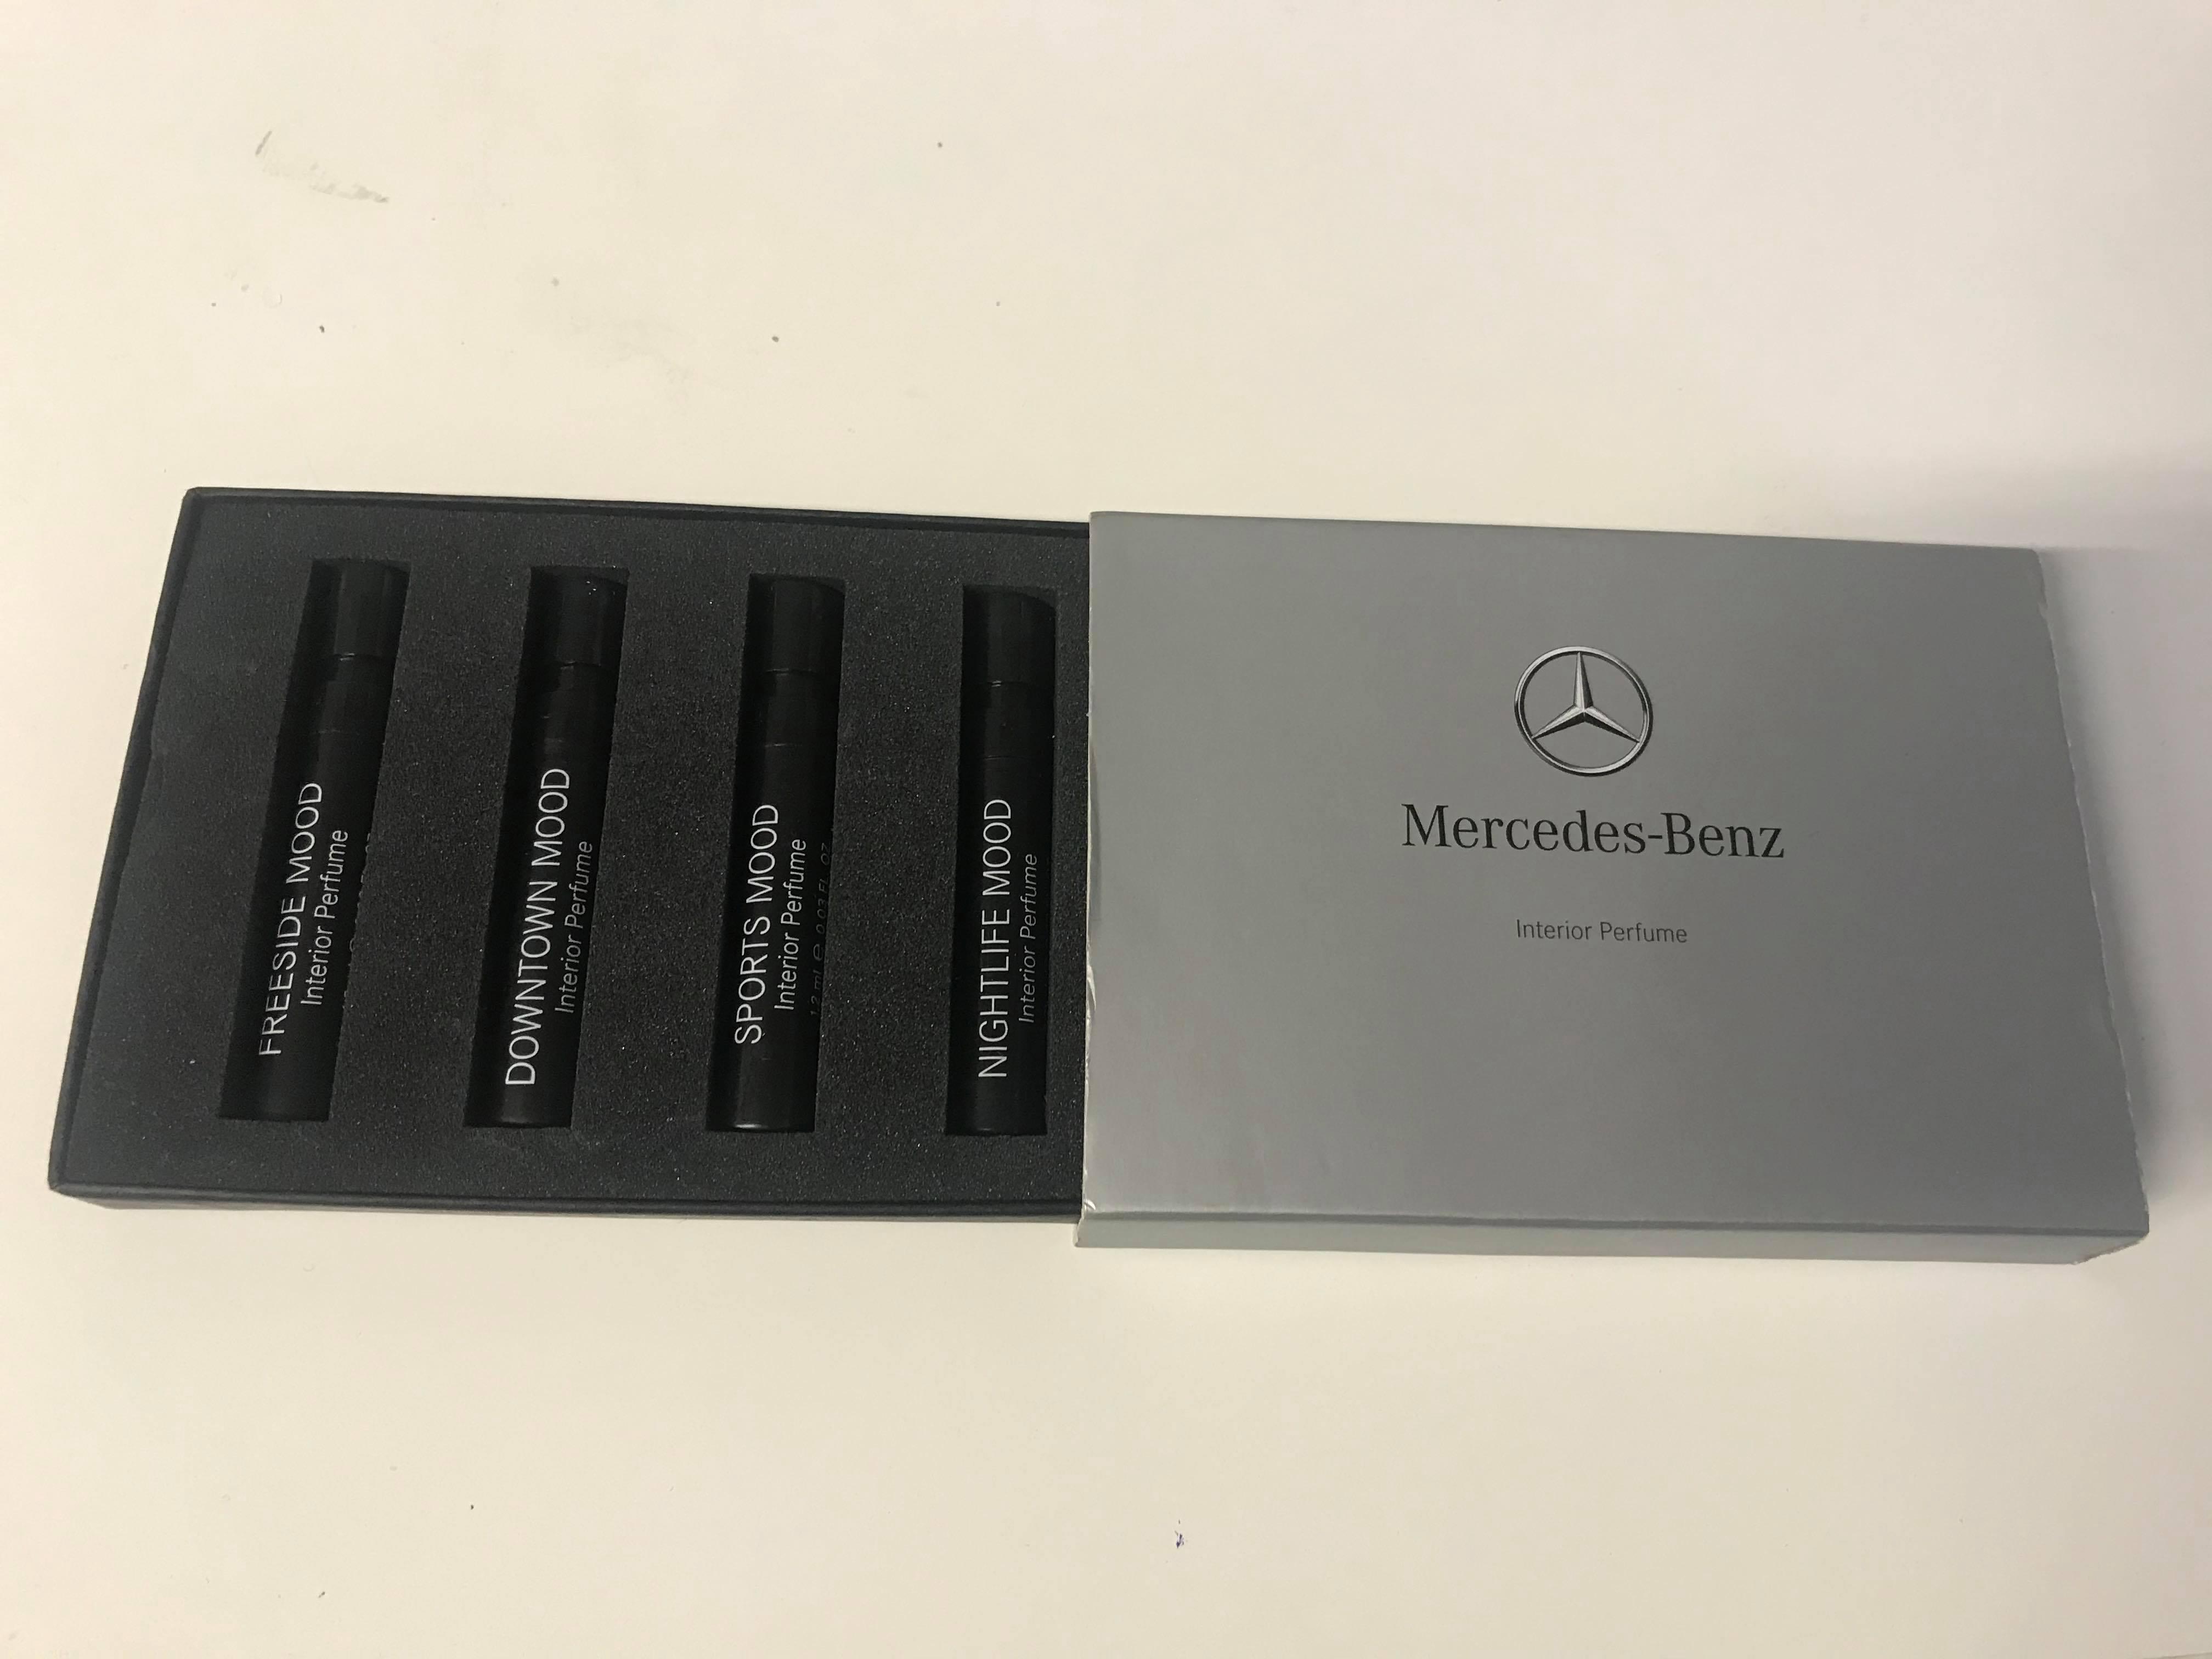 Mercedes Benz Illatminta 4x 1.2ml, Freeside Mood + Downtown Mood + Sports Mood + Nightlife Mood